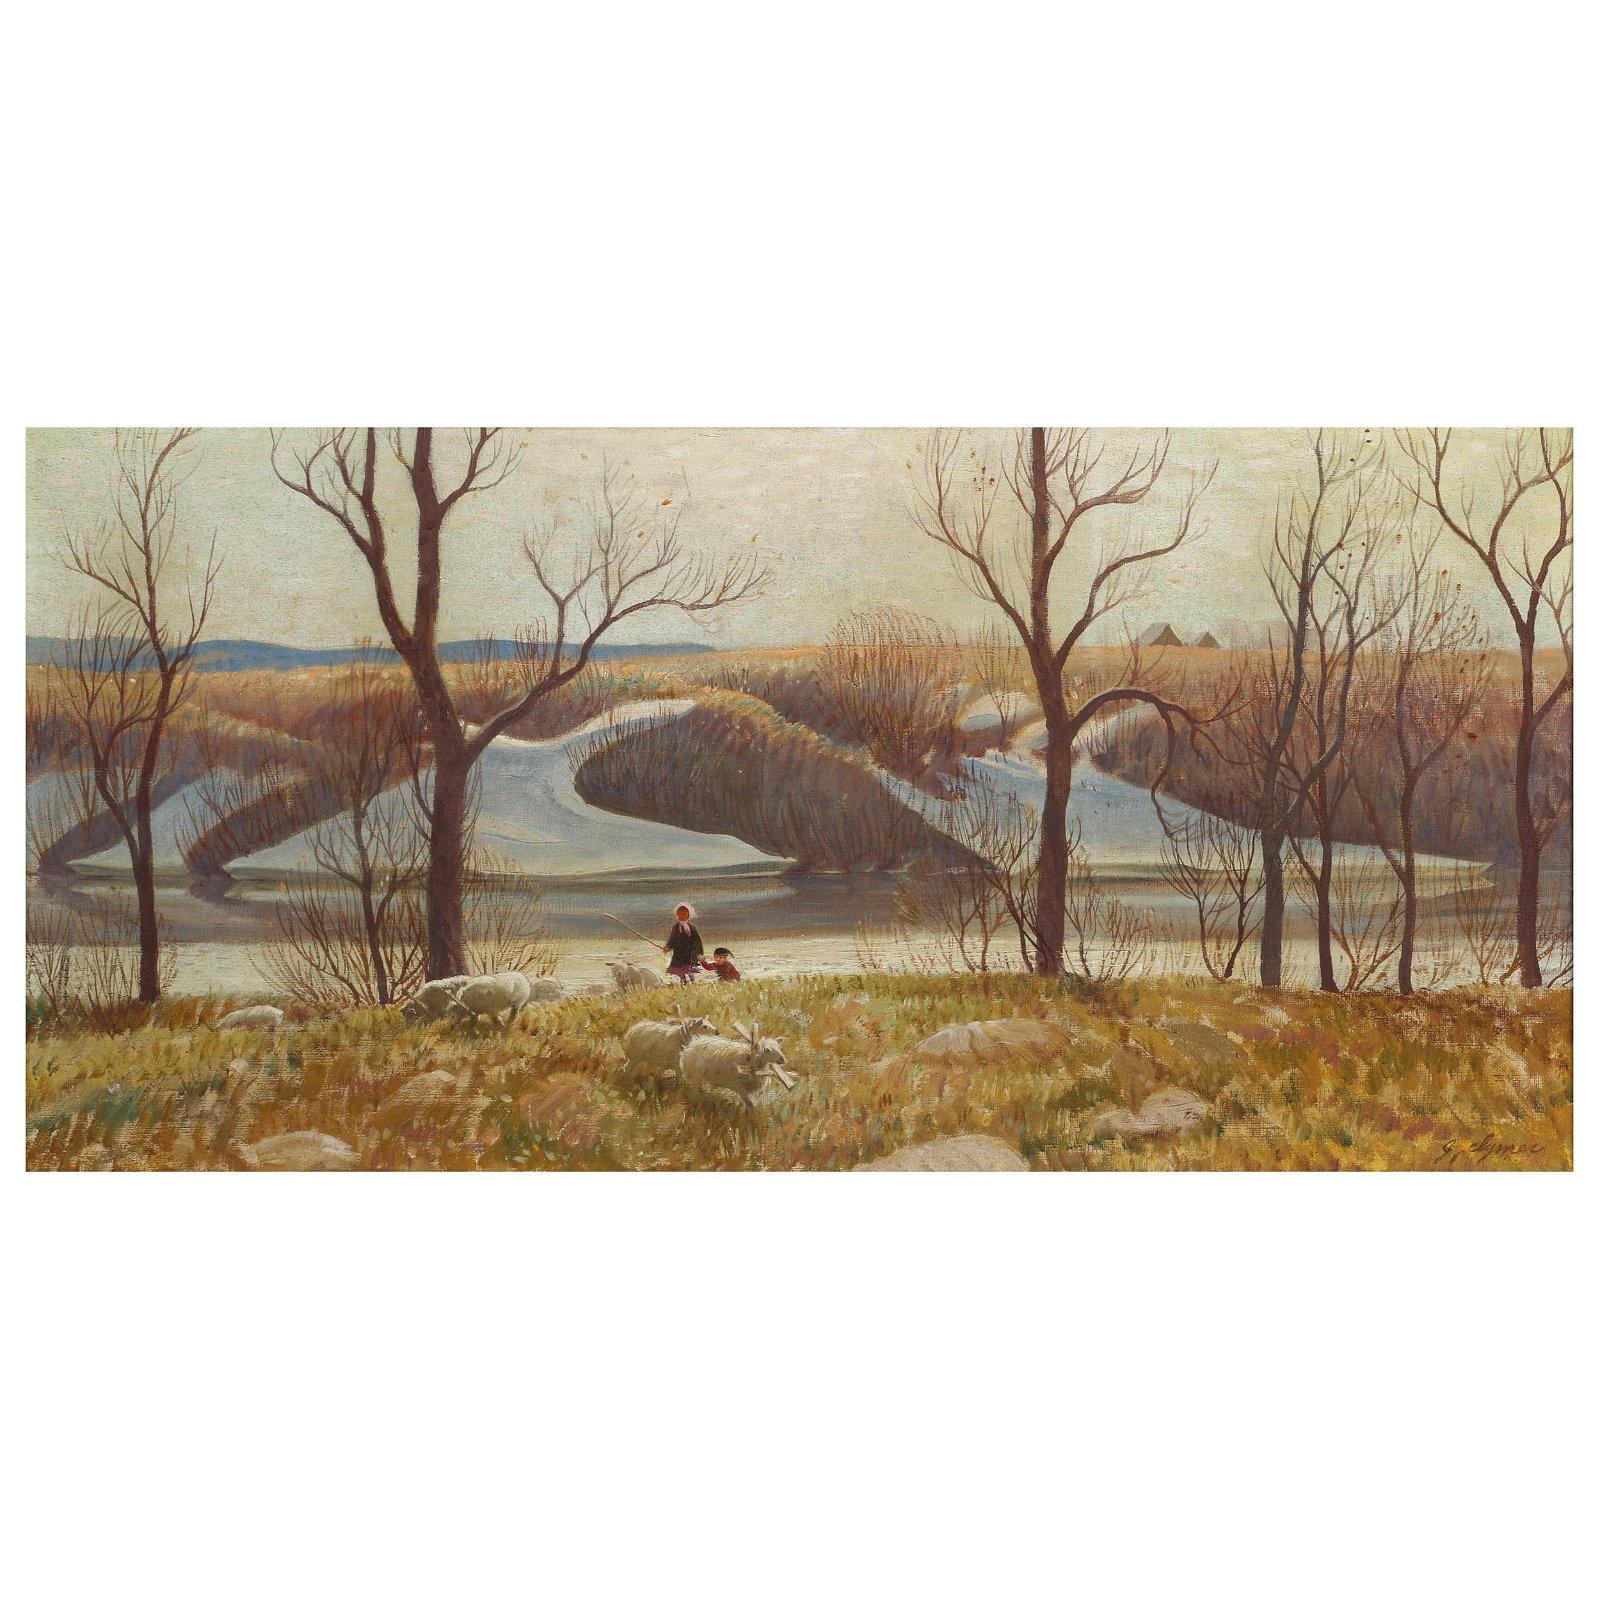 John Ford Clymer (American 1907-1989) Oil Painting